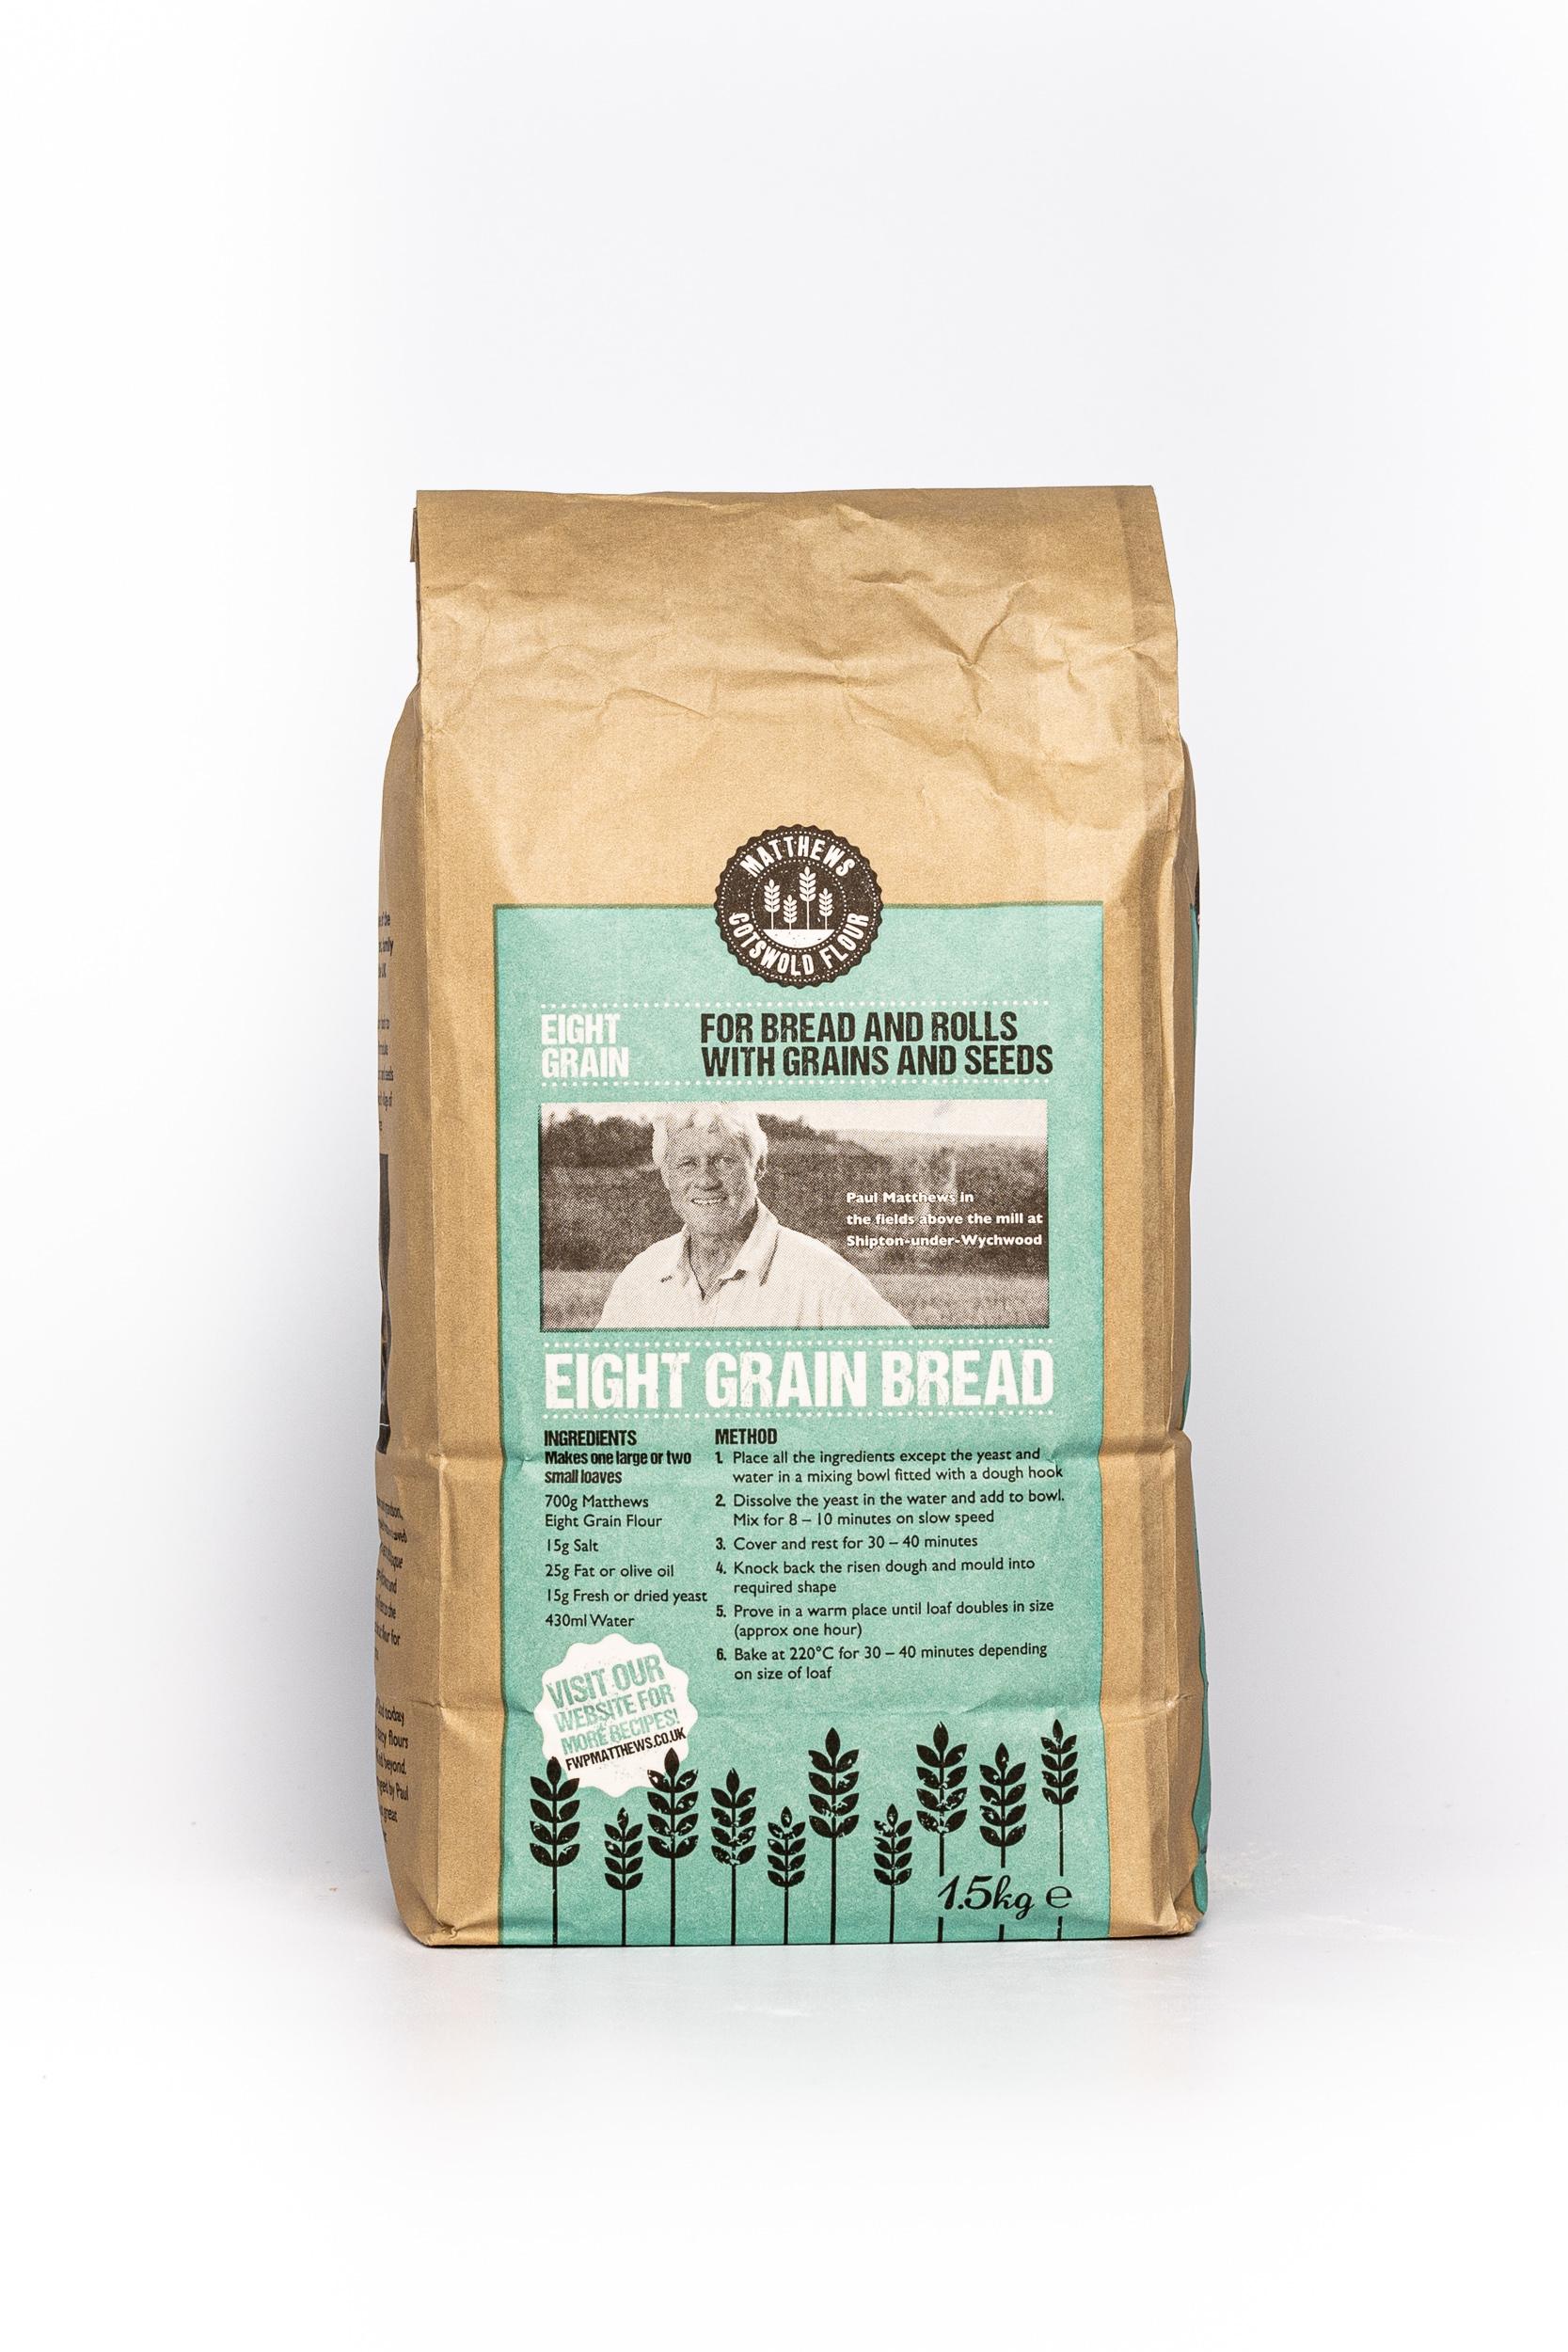 Eight Grain back